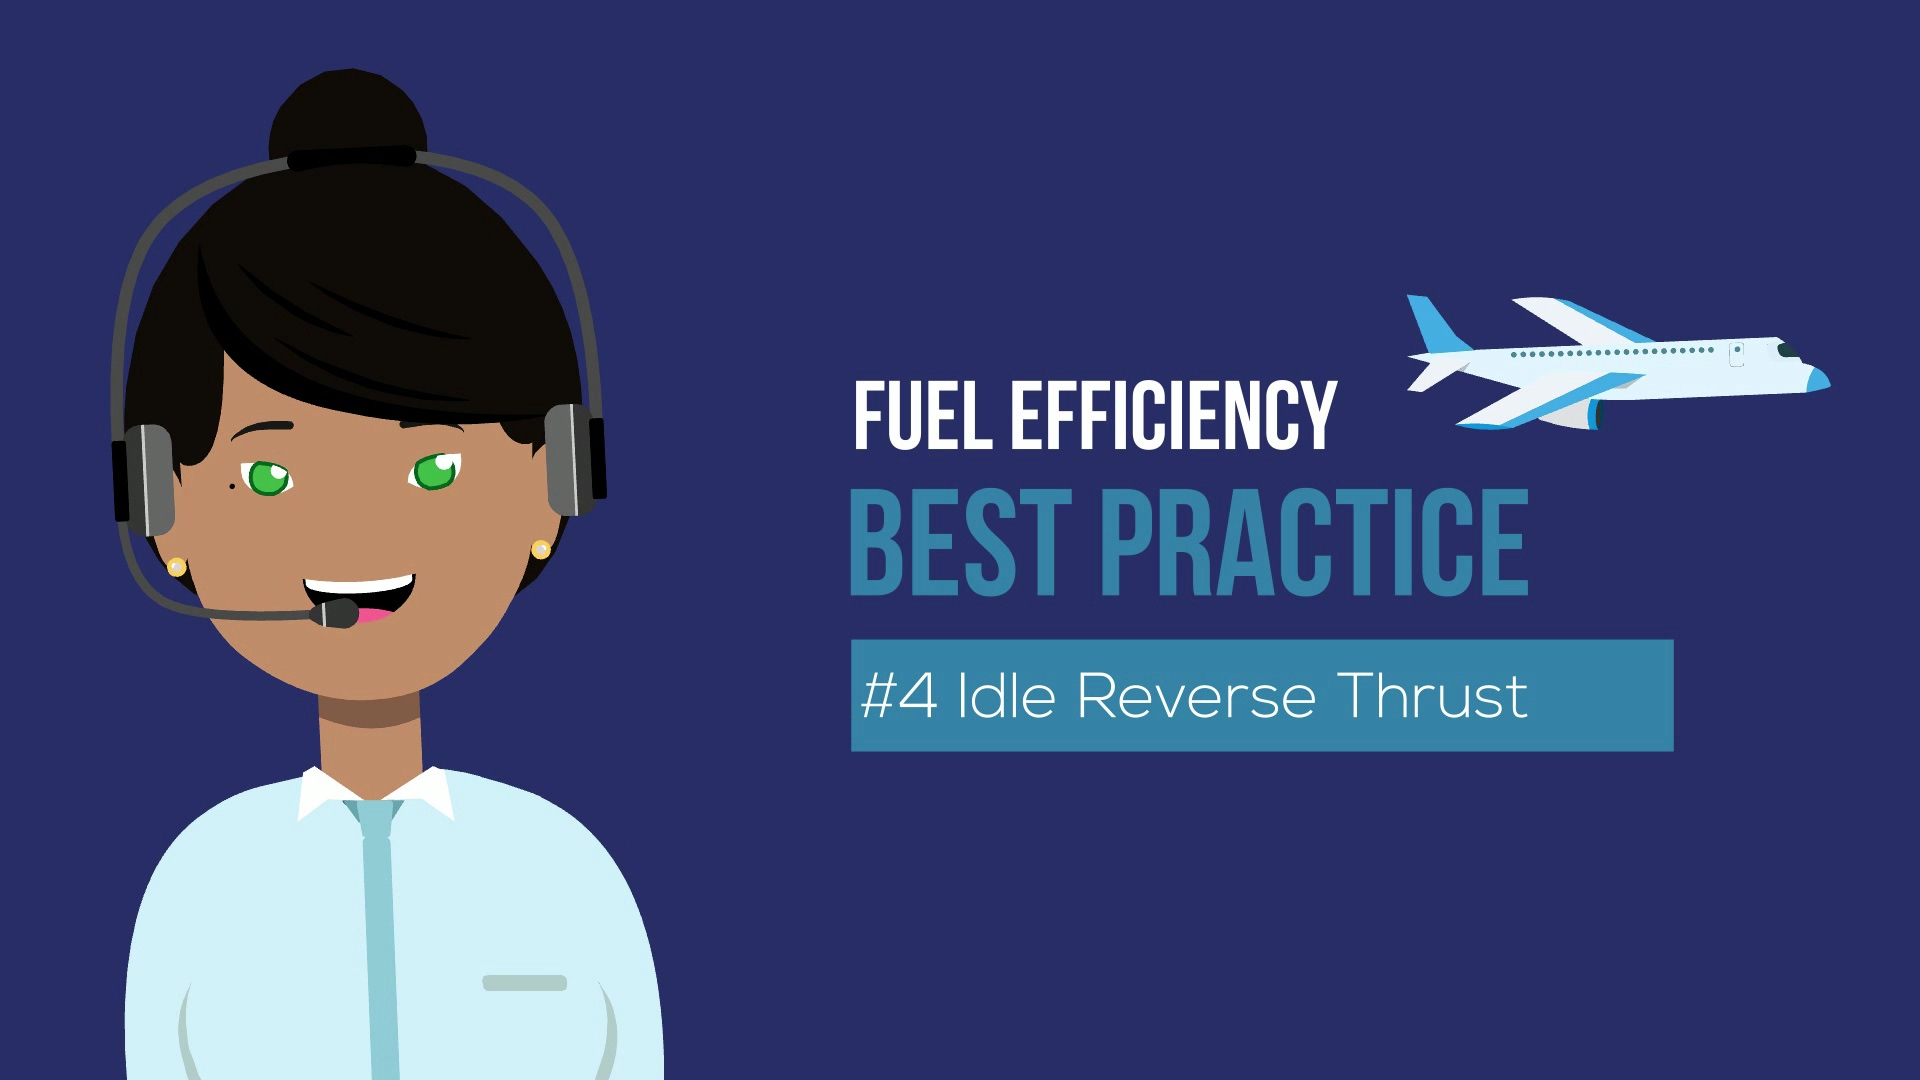 Fuel savings best practice - Idle Reverse Thrust